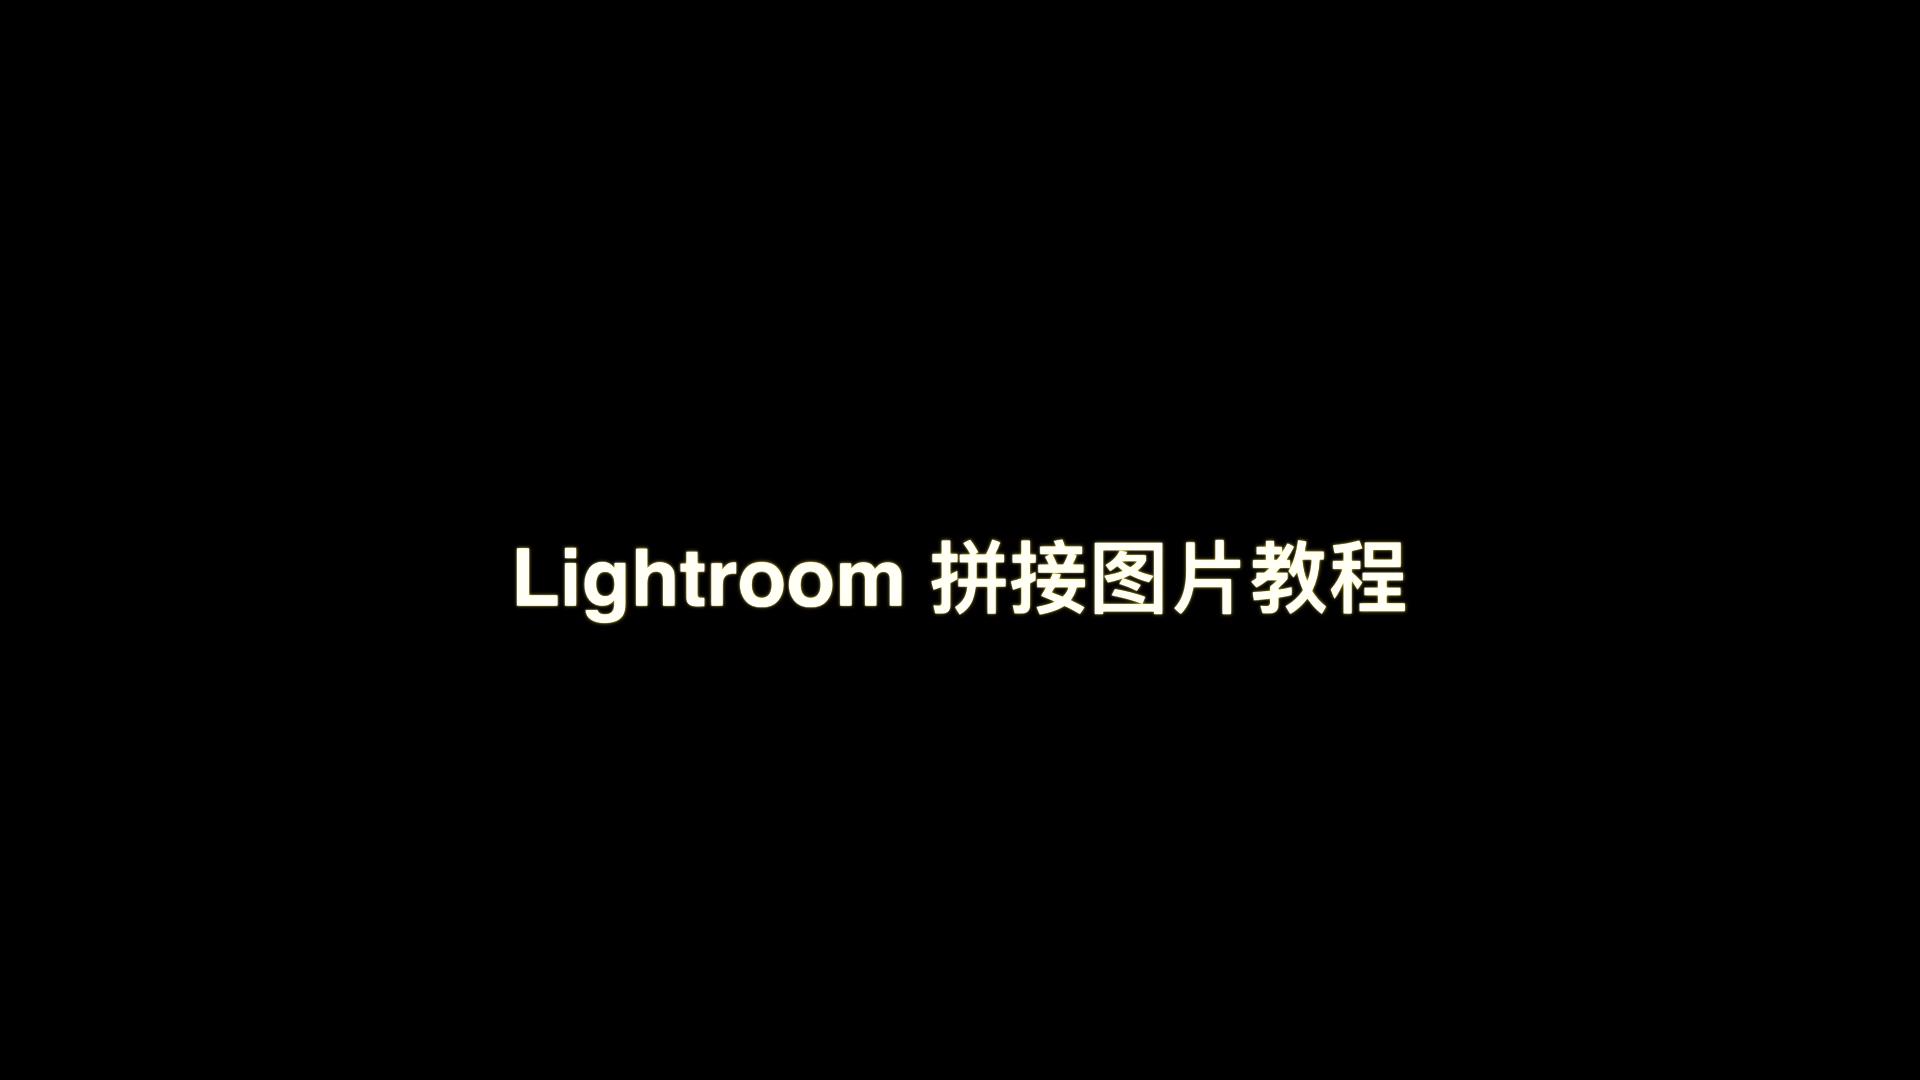 2017 lightroom拼图教程_2017年7月11日 下午10.55.31.png